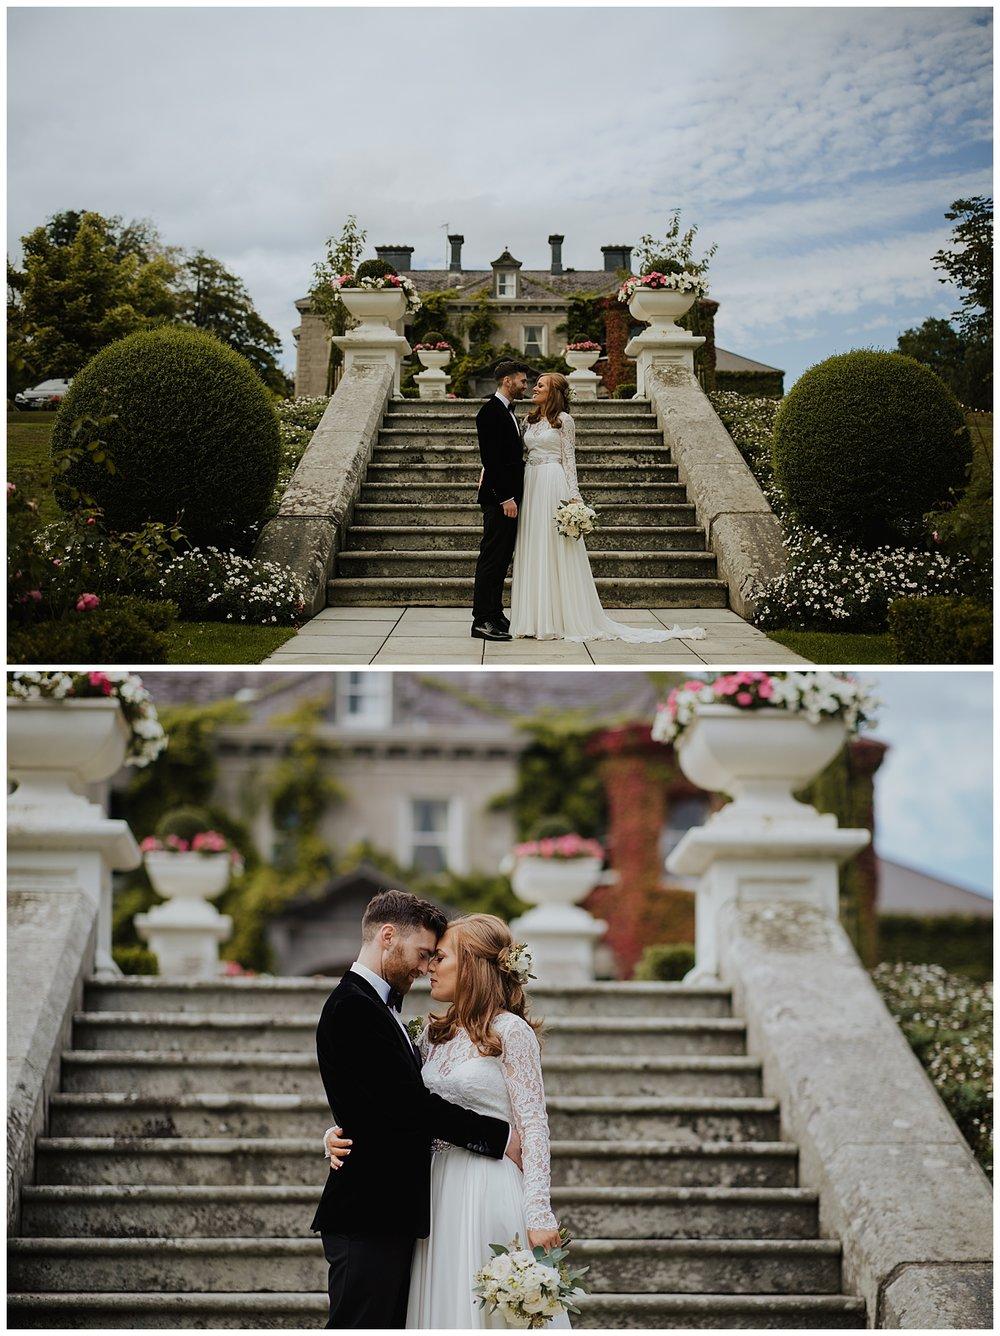 a&c_tinakilly_black_tie_wedding_photographer_livia_figueiredo_127.jpg